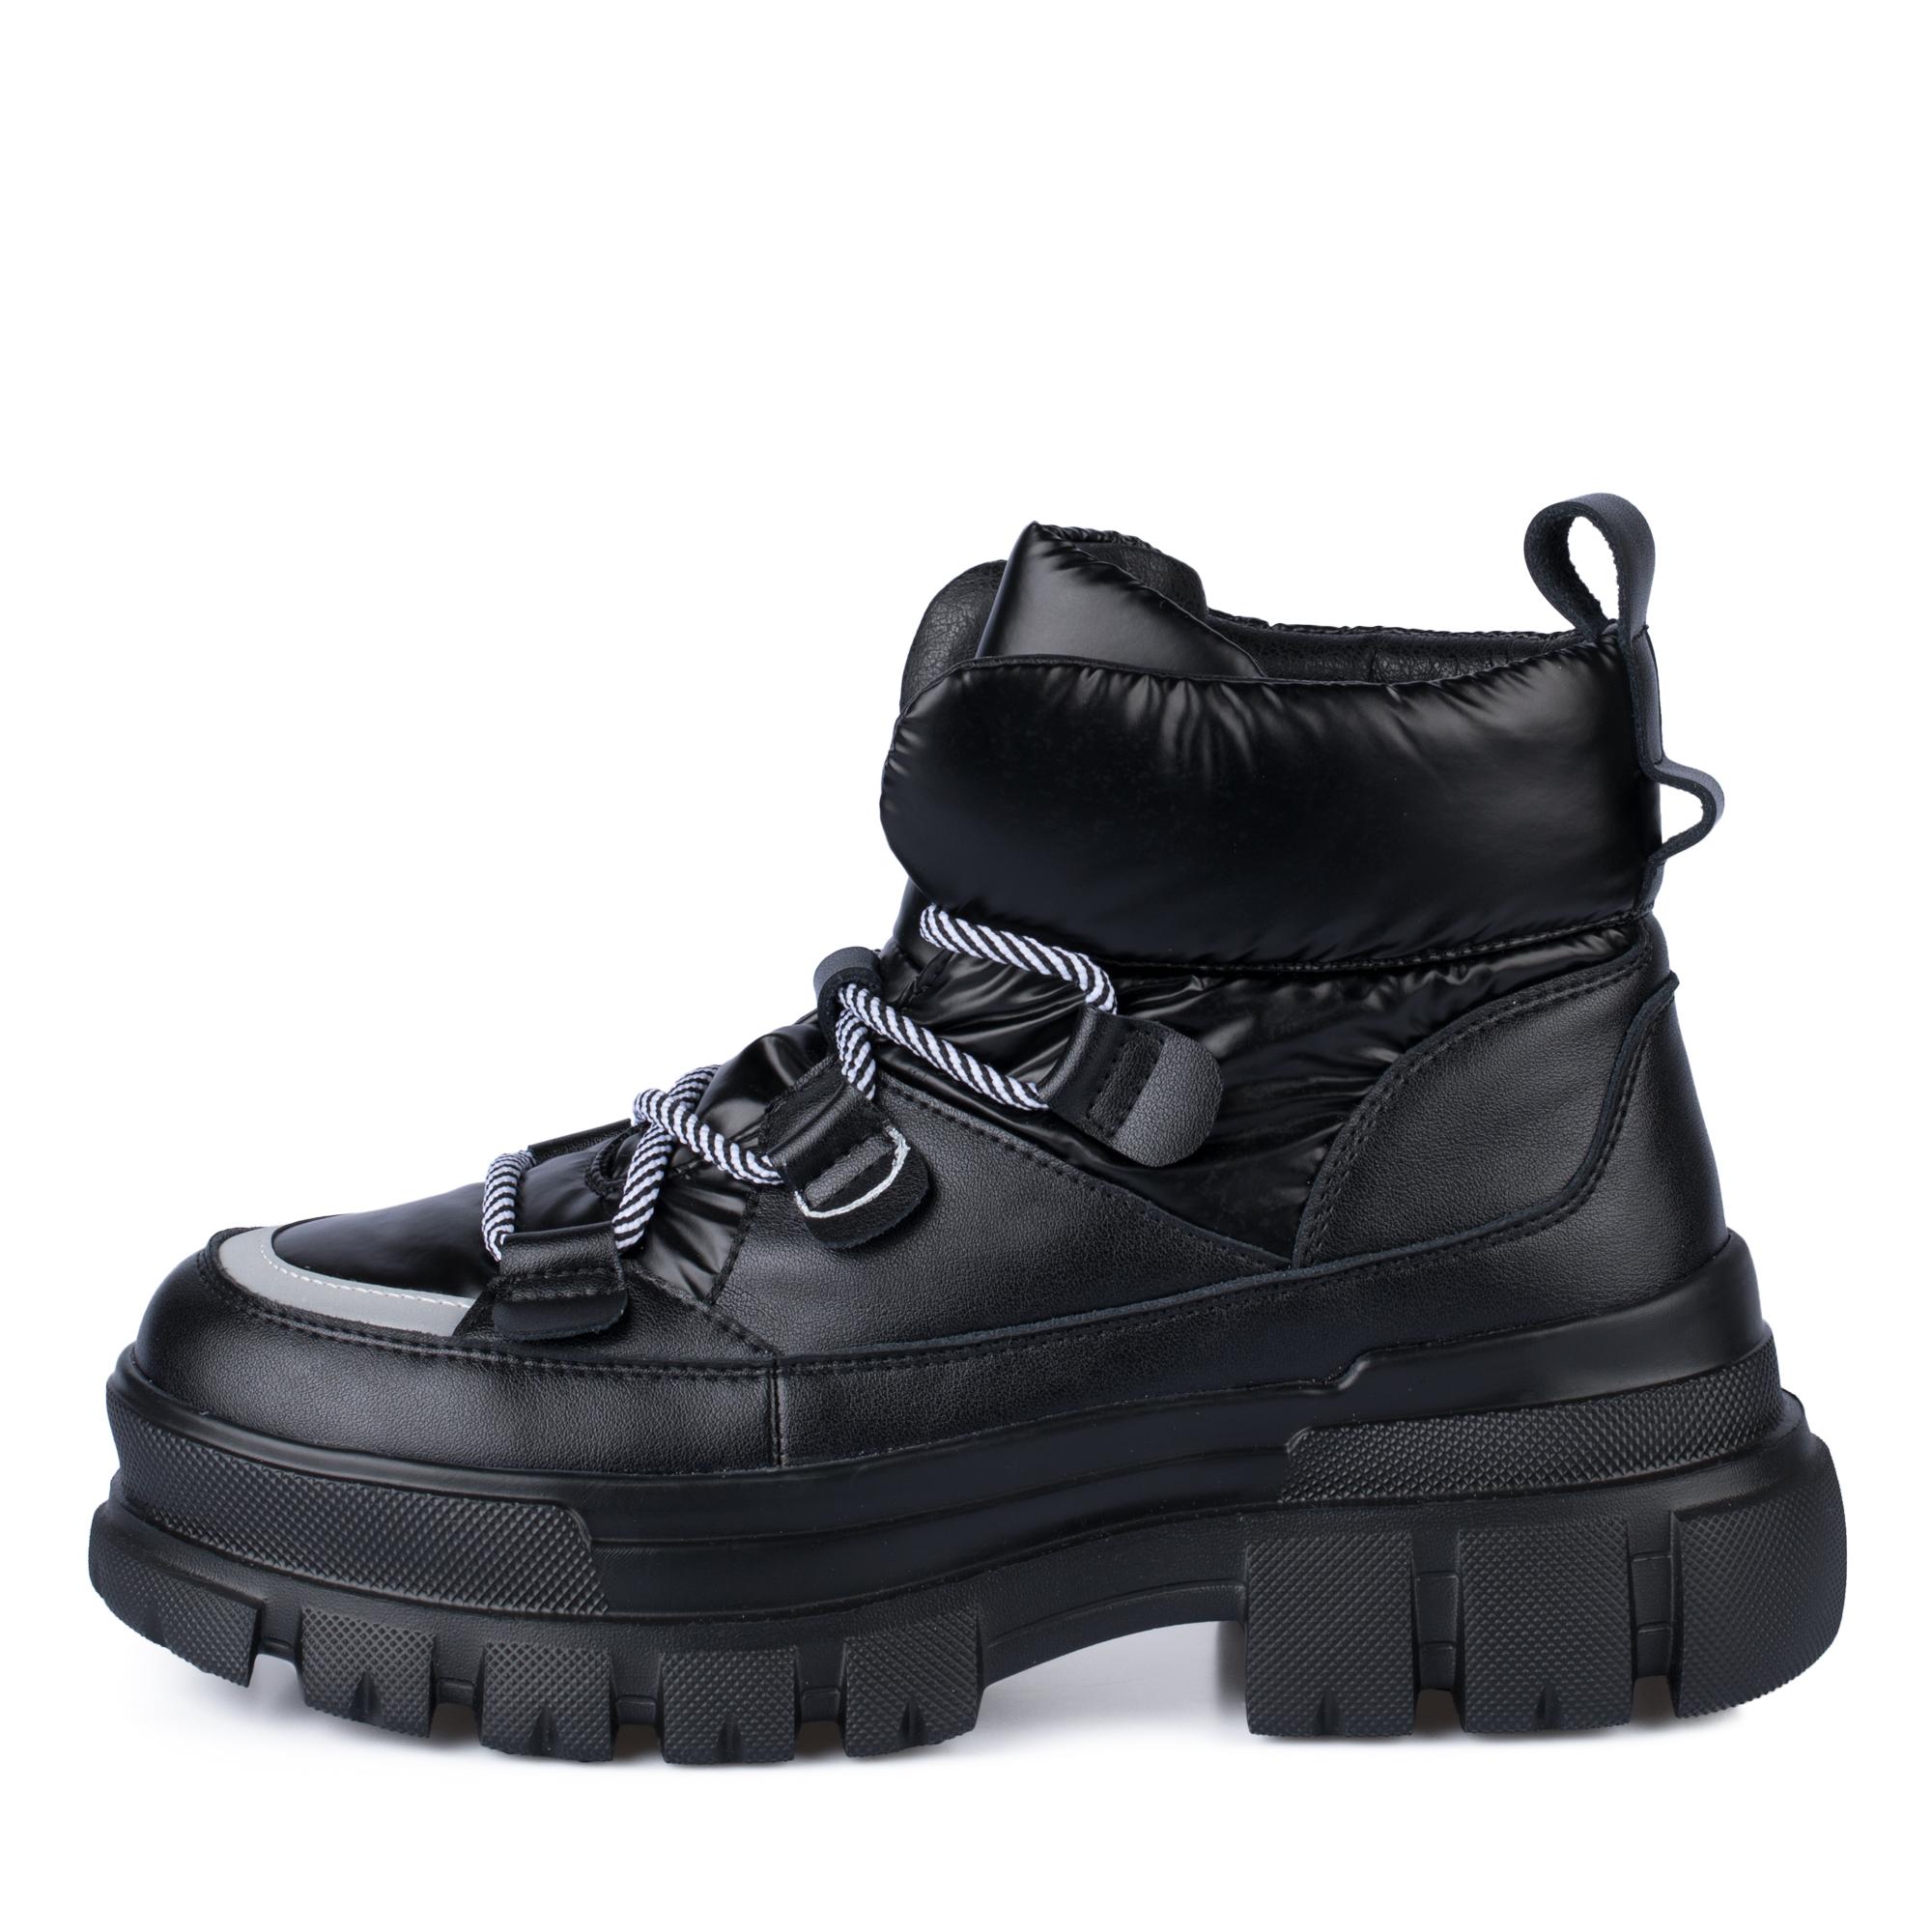 Ботинки Thomas Munz 095-081A-2602